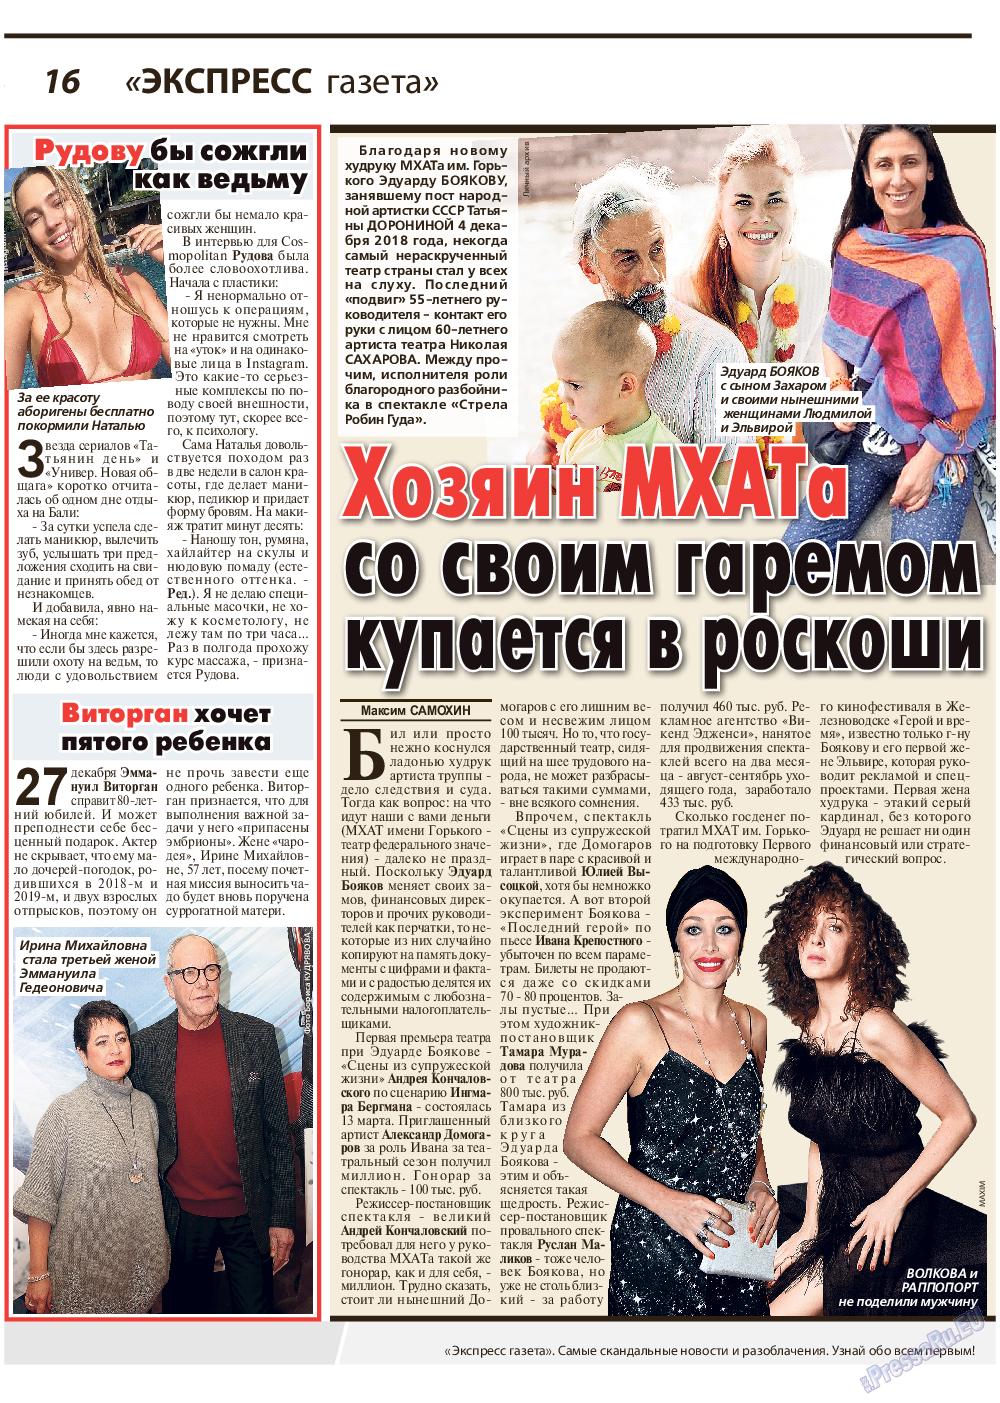 Экспресс газета (газета). 2020 год, номер 1, стр. 16